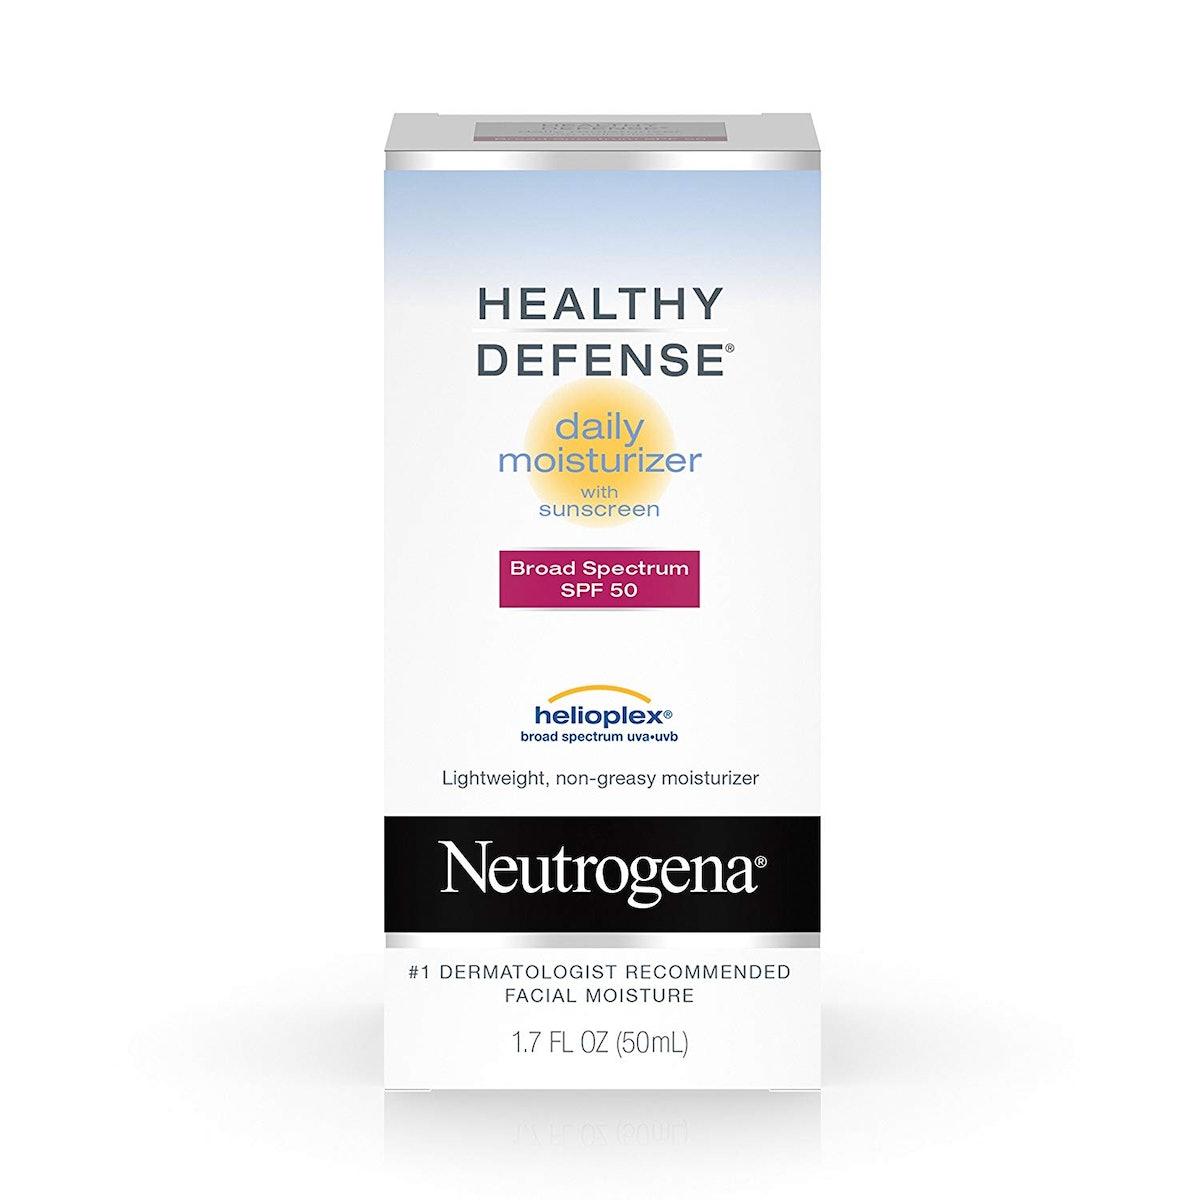 Neutrogena Healthy Defense Daily Moisturizer with Broad Spectrum SPF 50